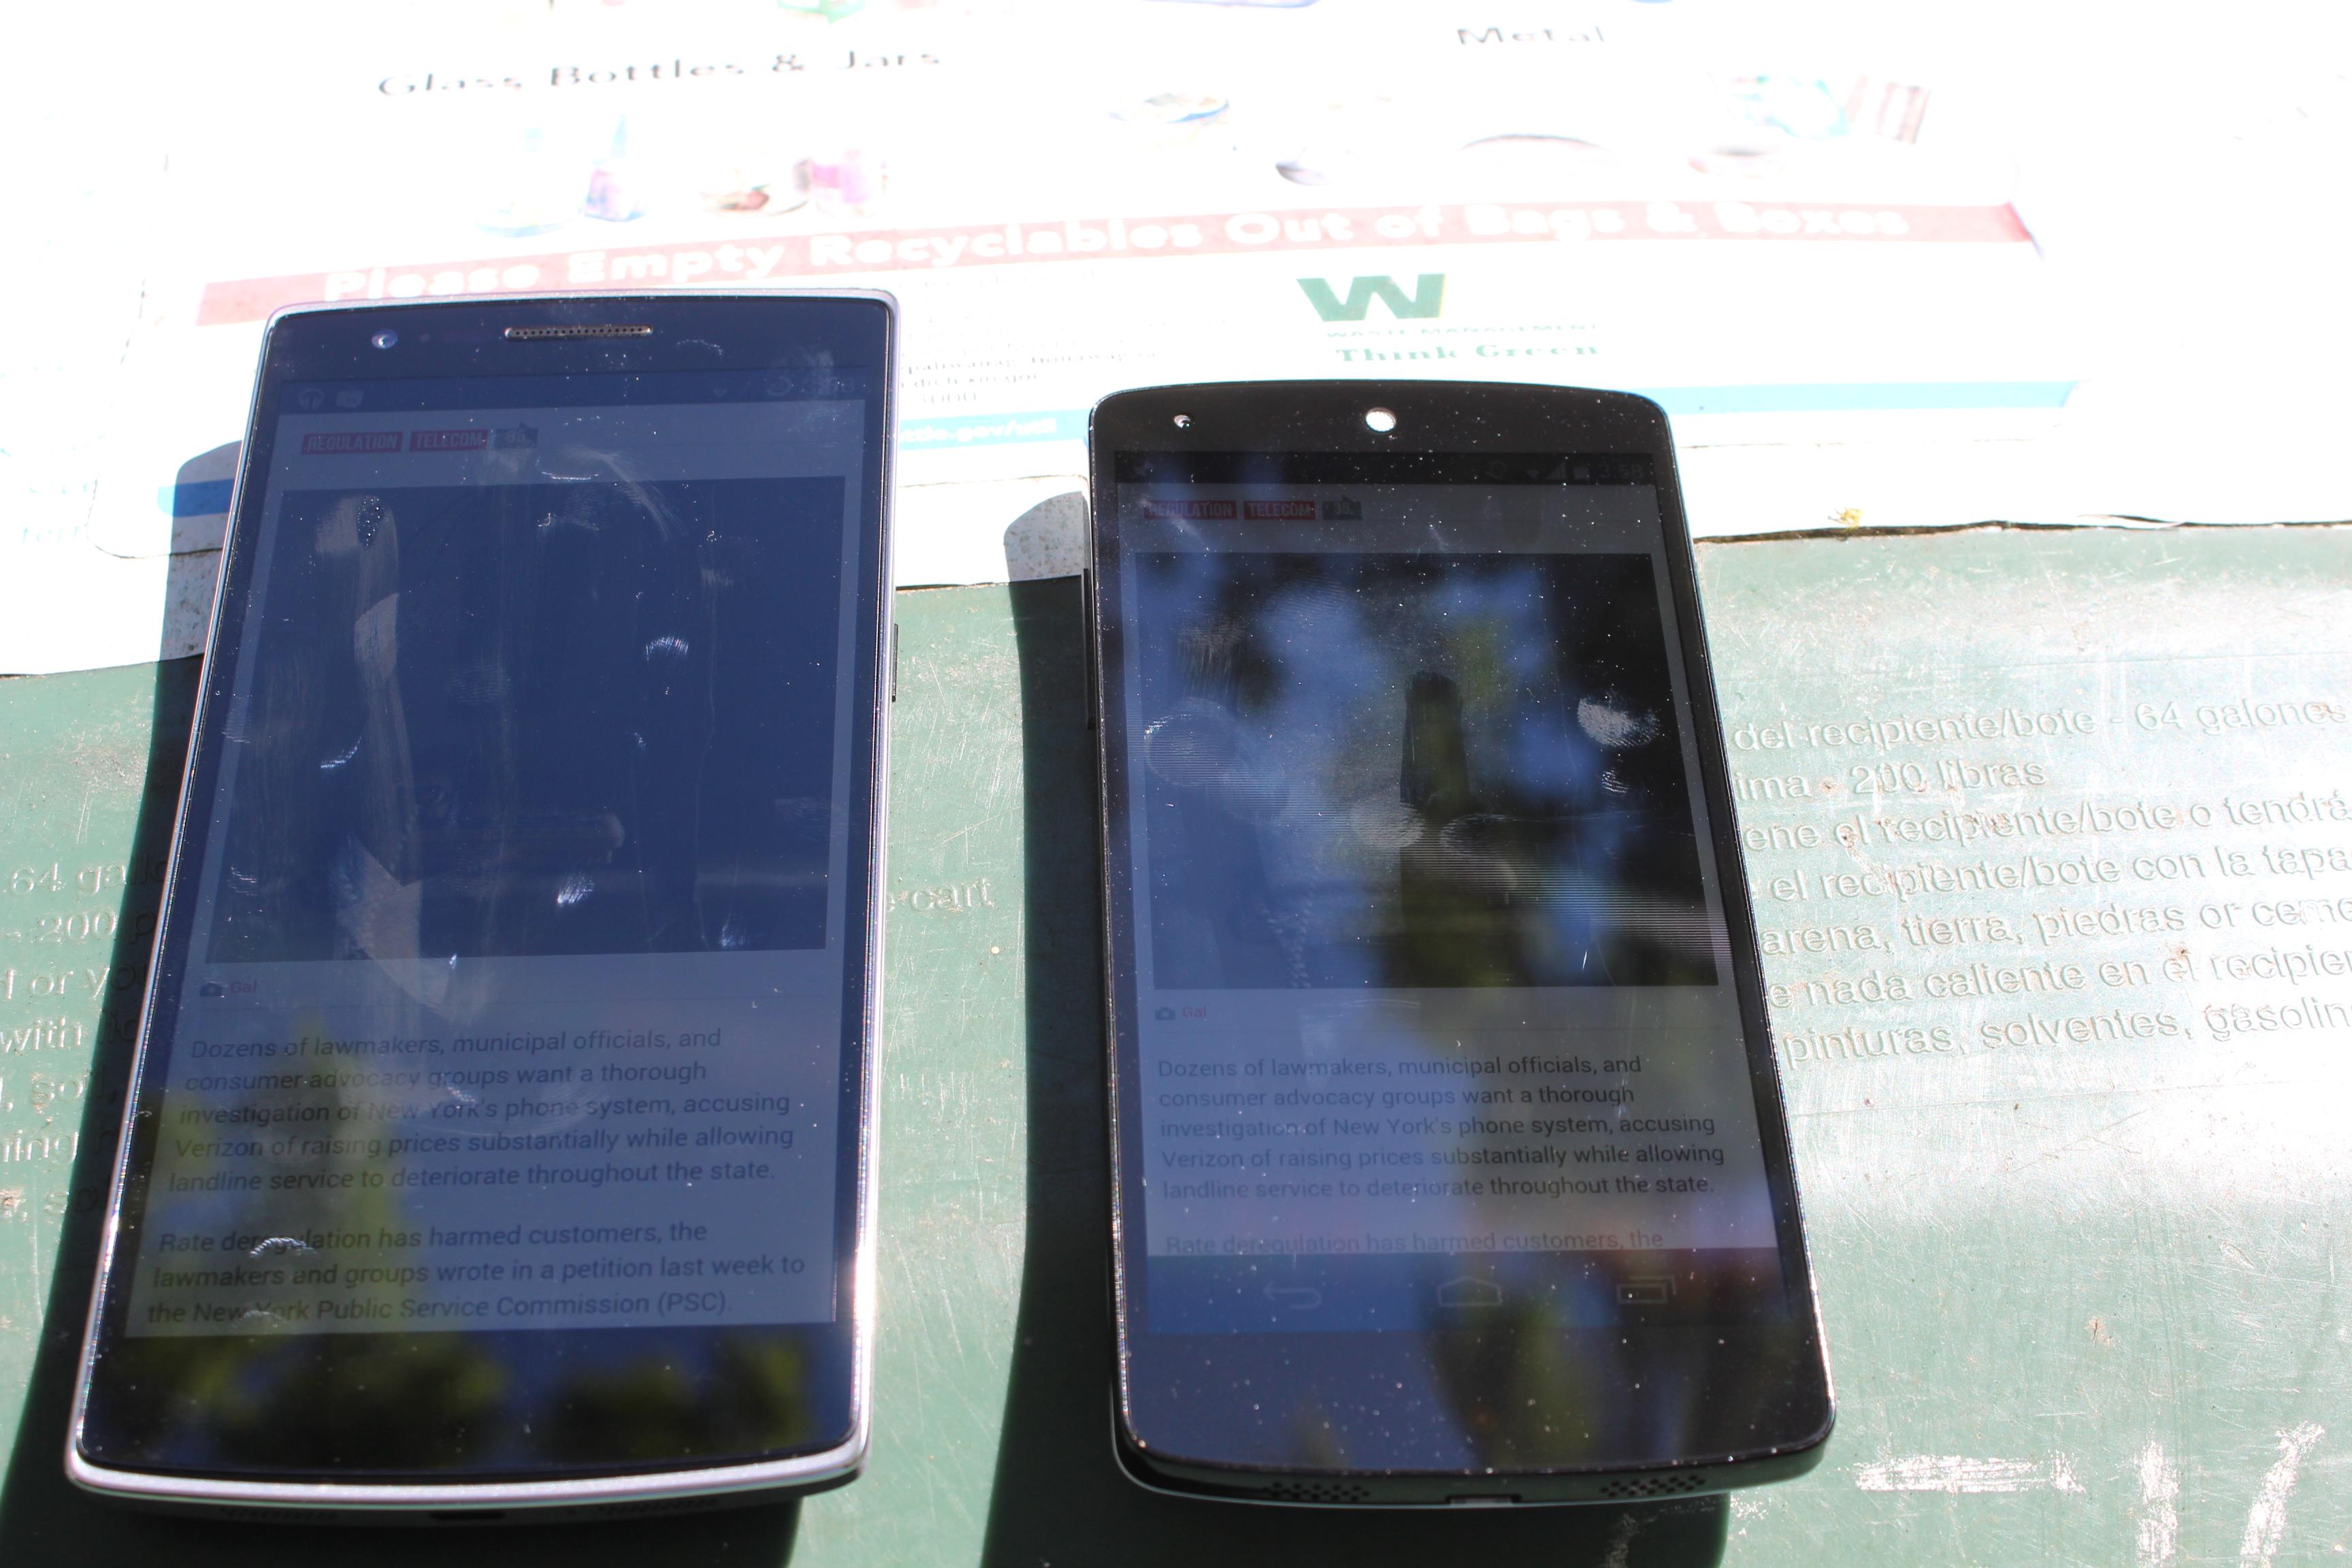 A OnePlus One and Nexus 5 set to maximum brightness in direct sunlight.